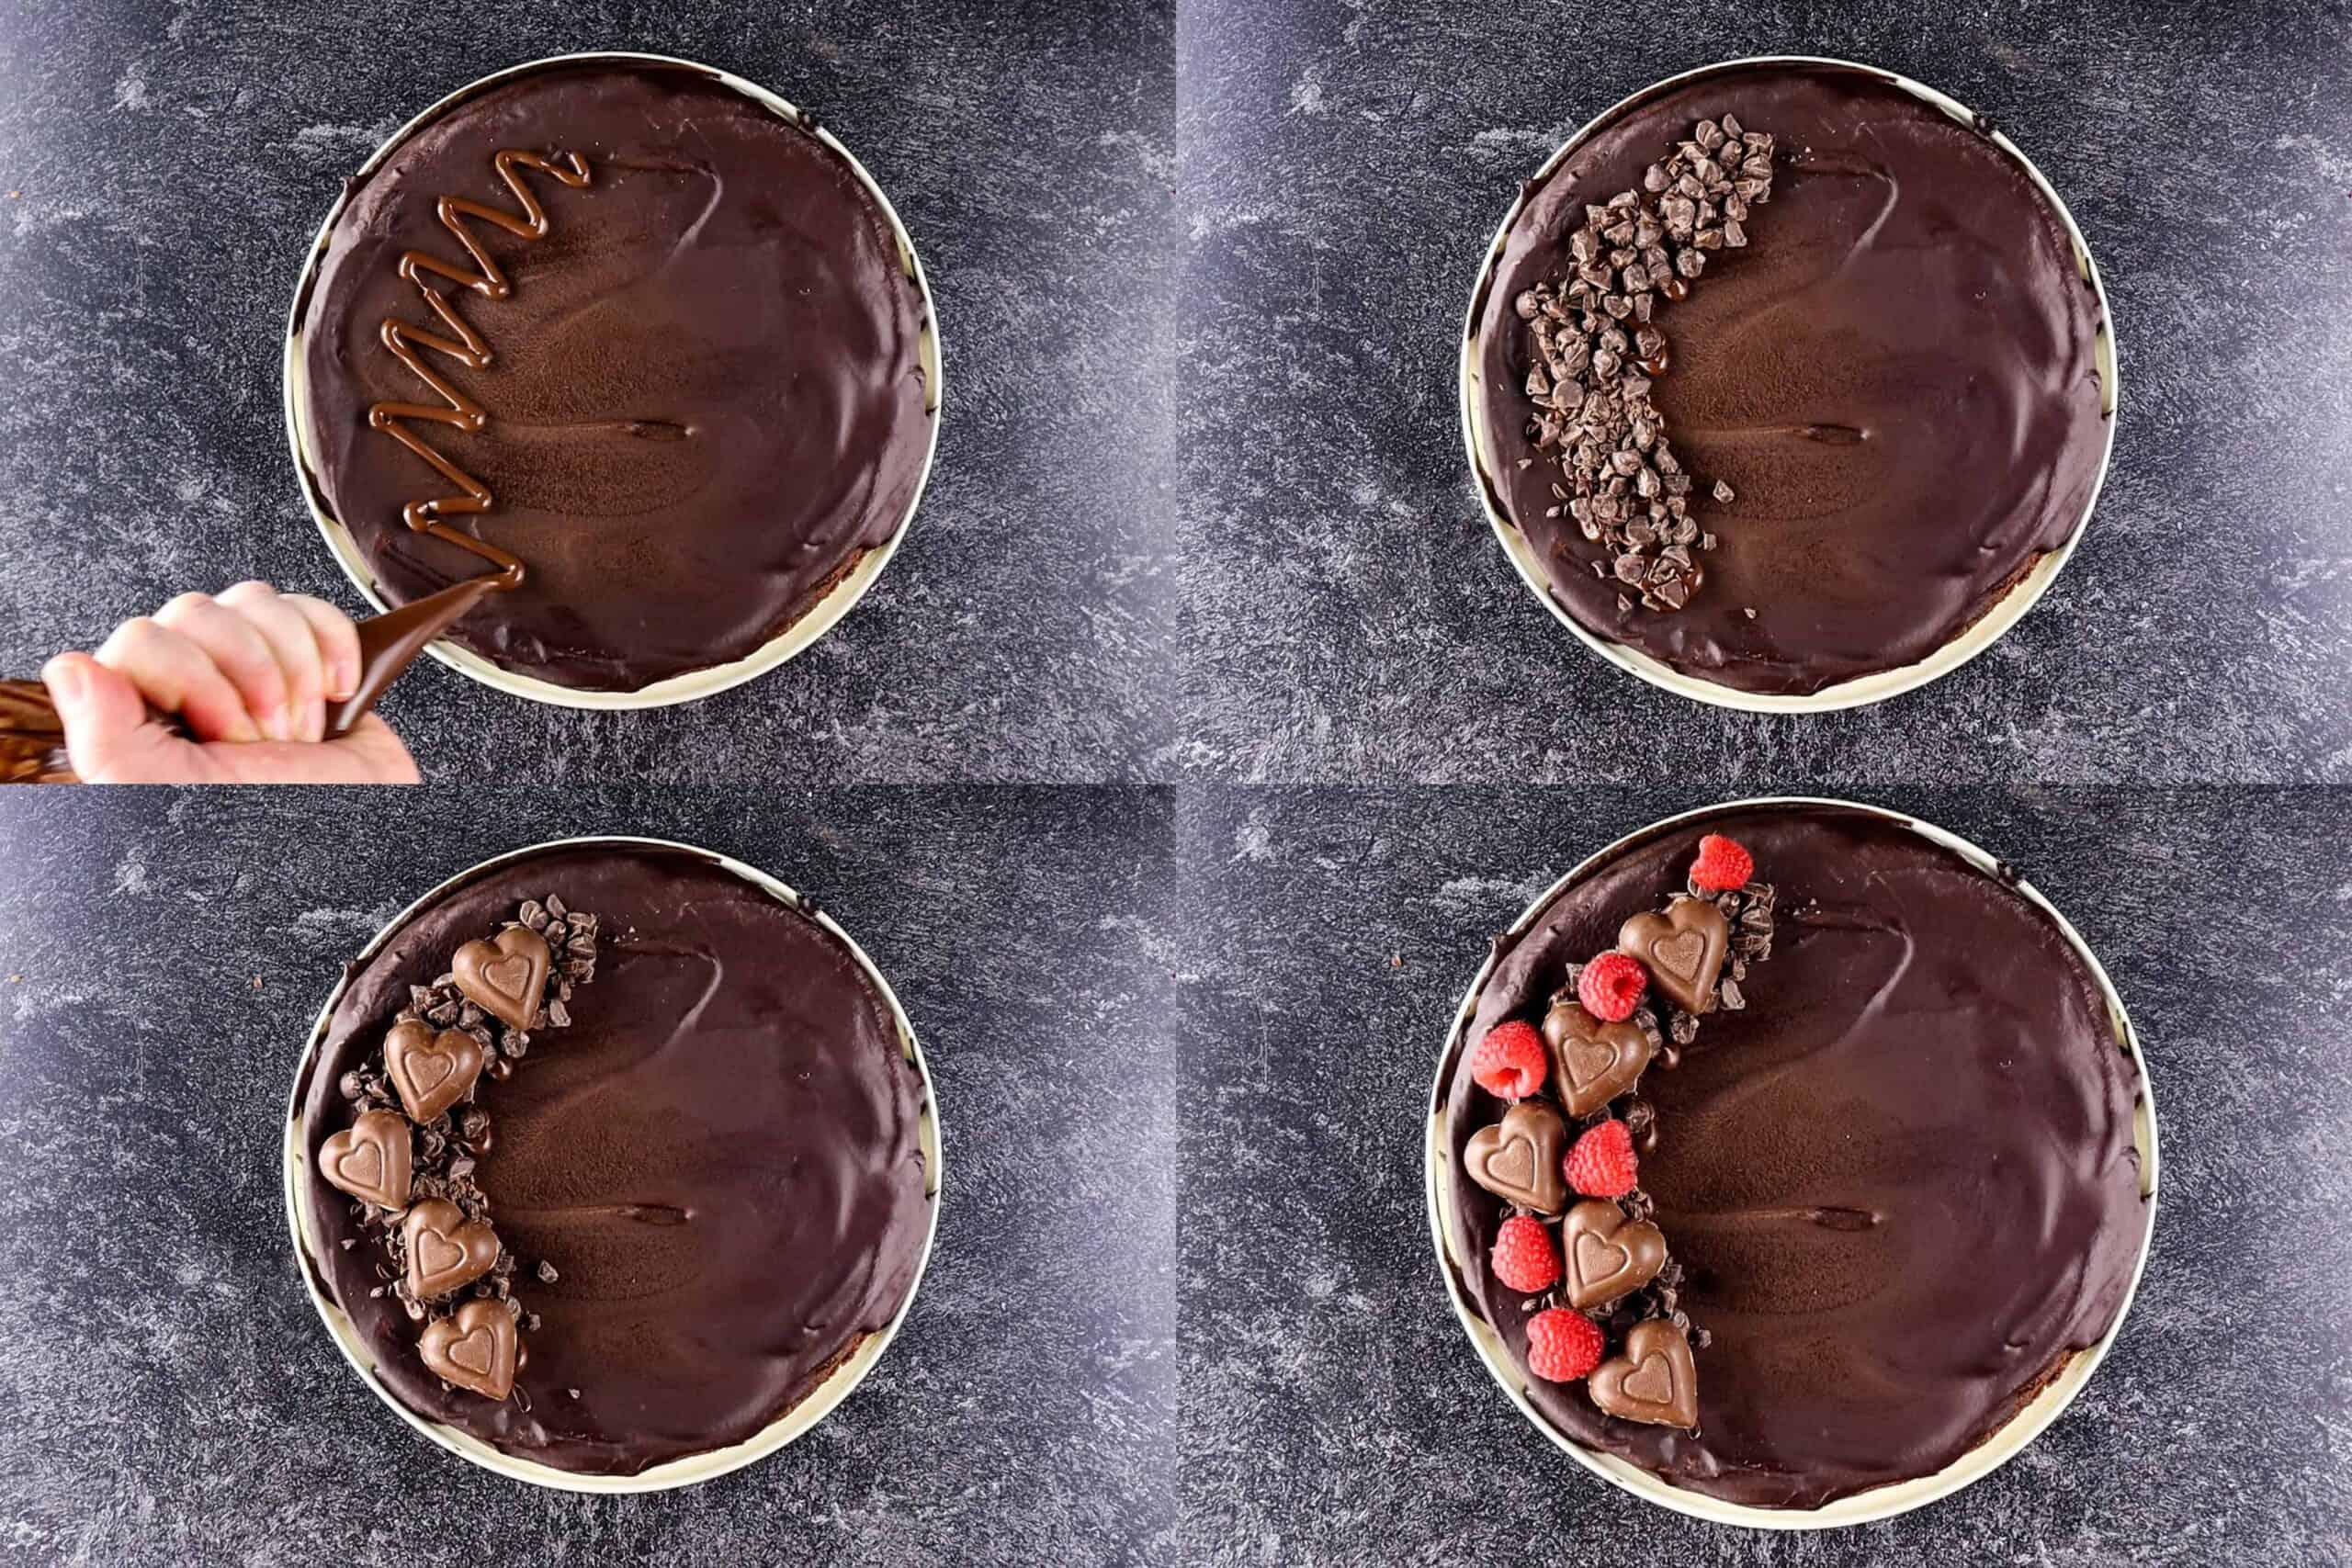 decorating the truffle cake process shots